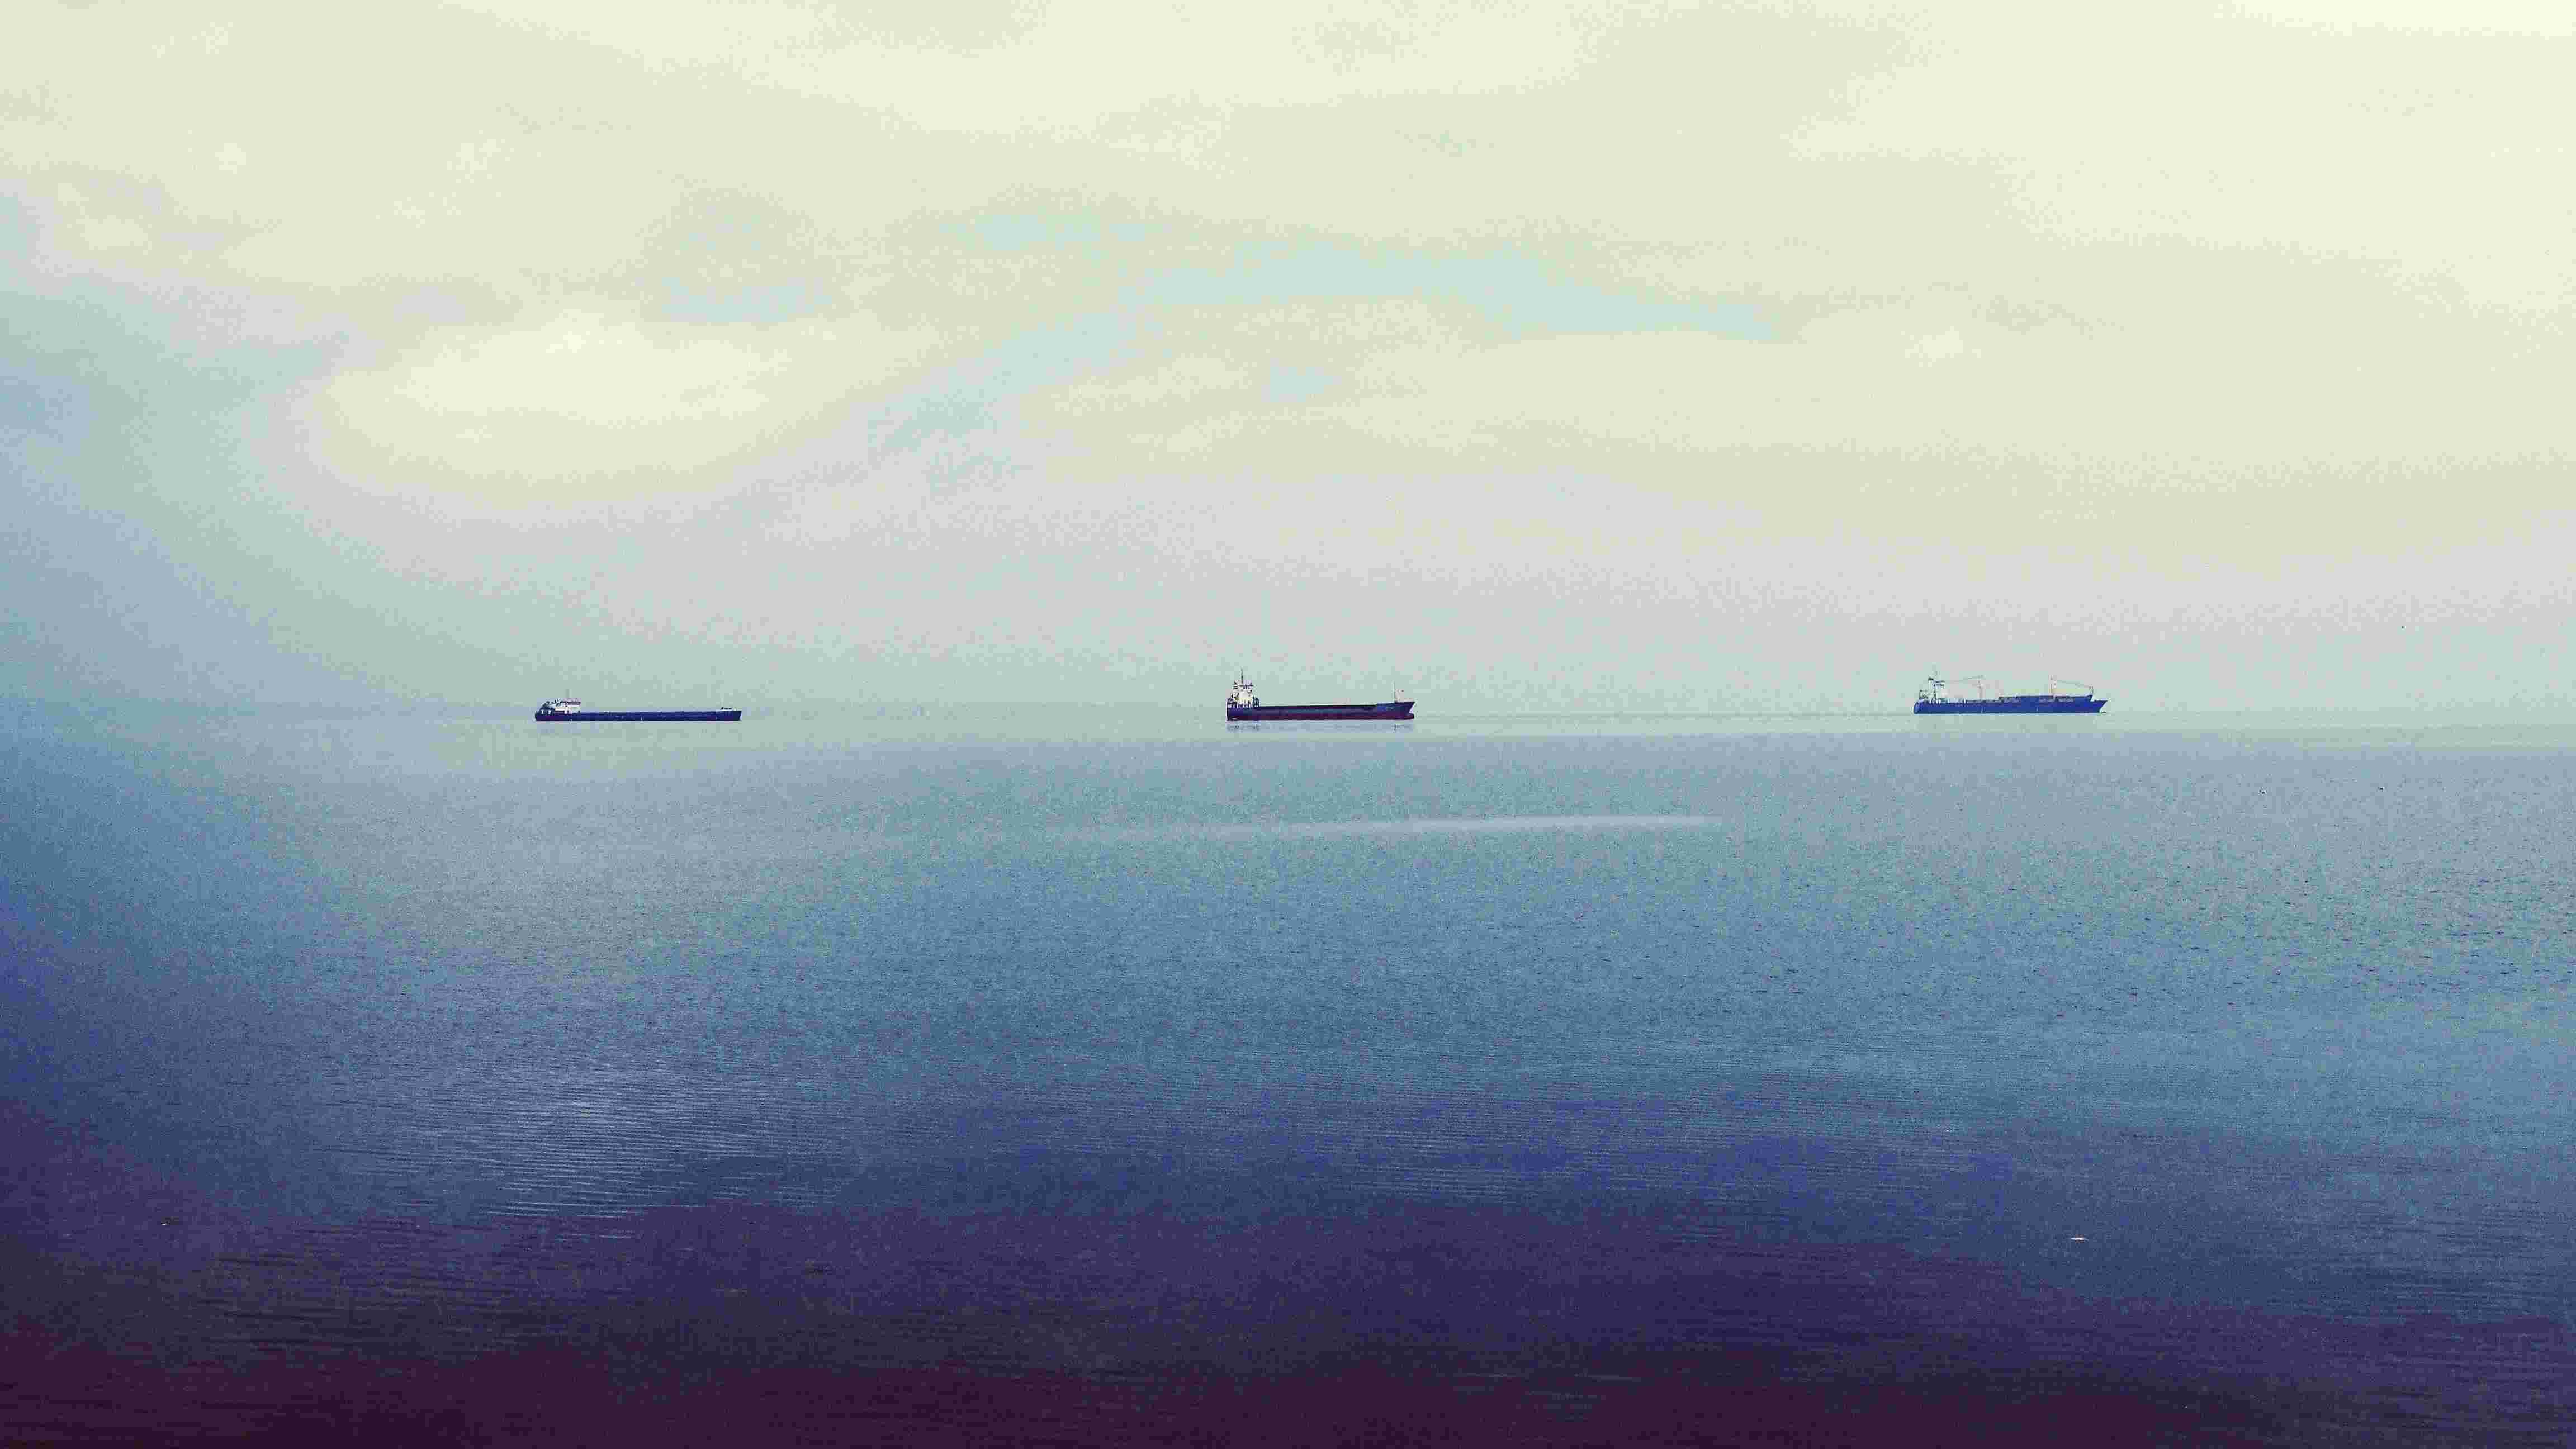 CargoSchiffeexp